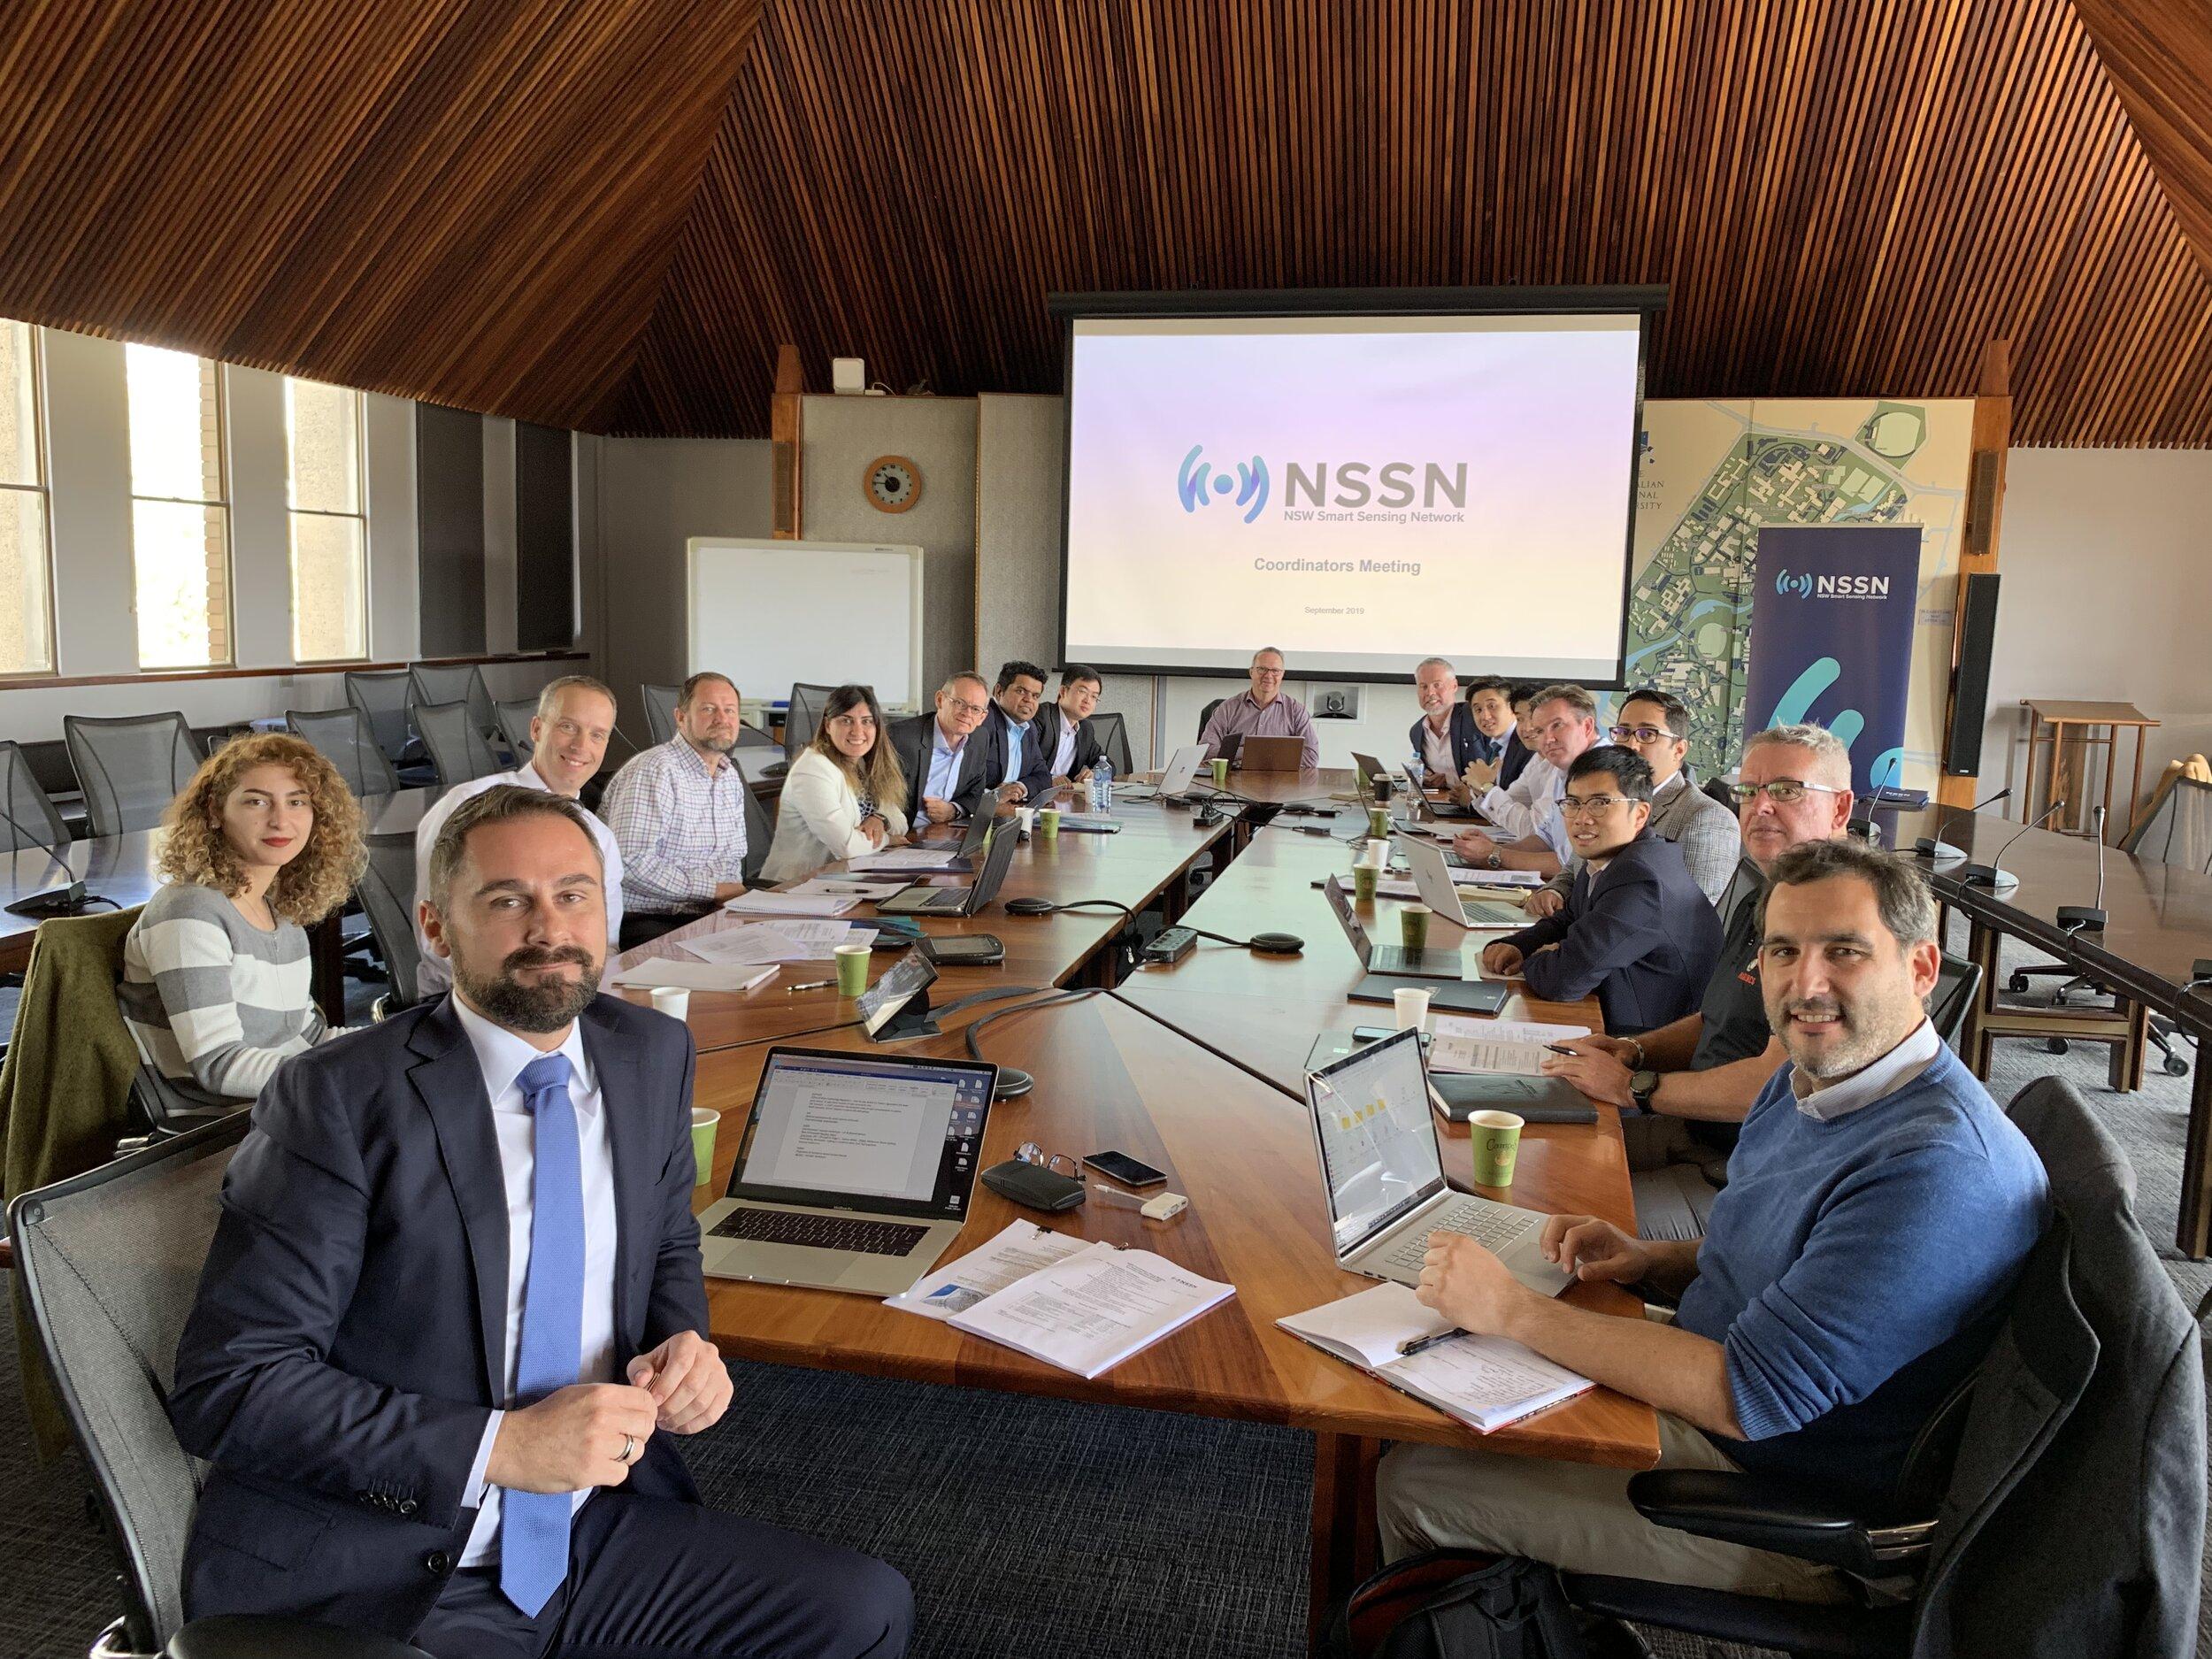 NSW Smart Sensing Network at the Australian National University